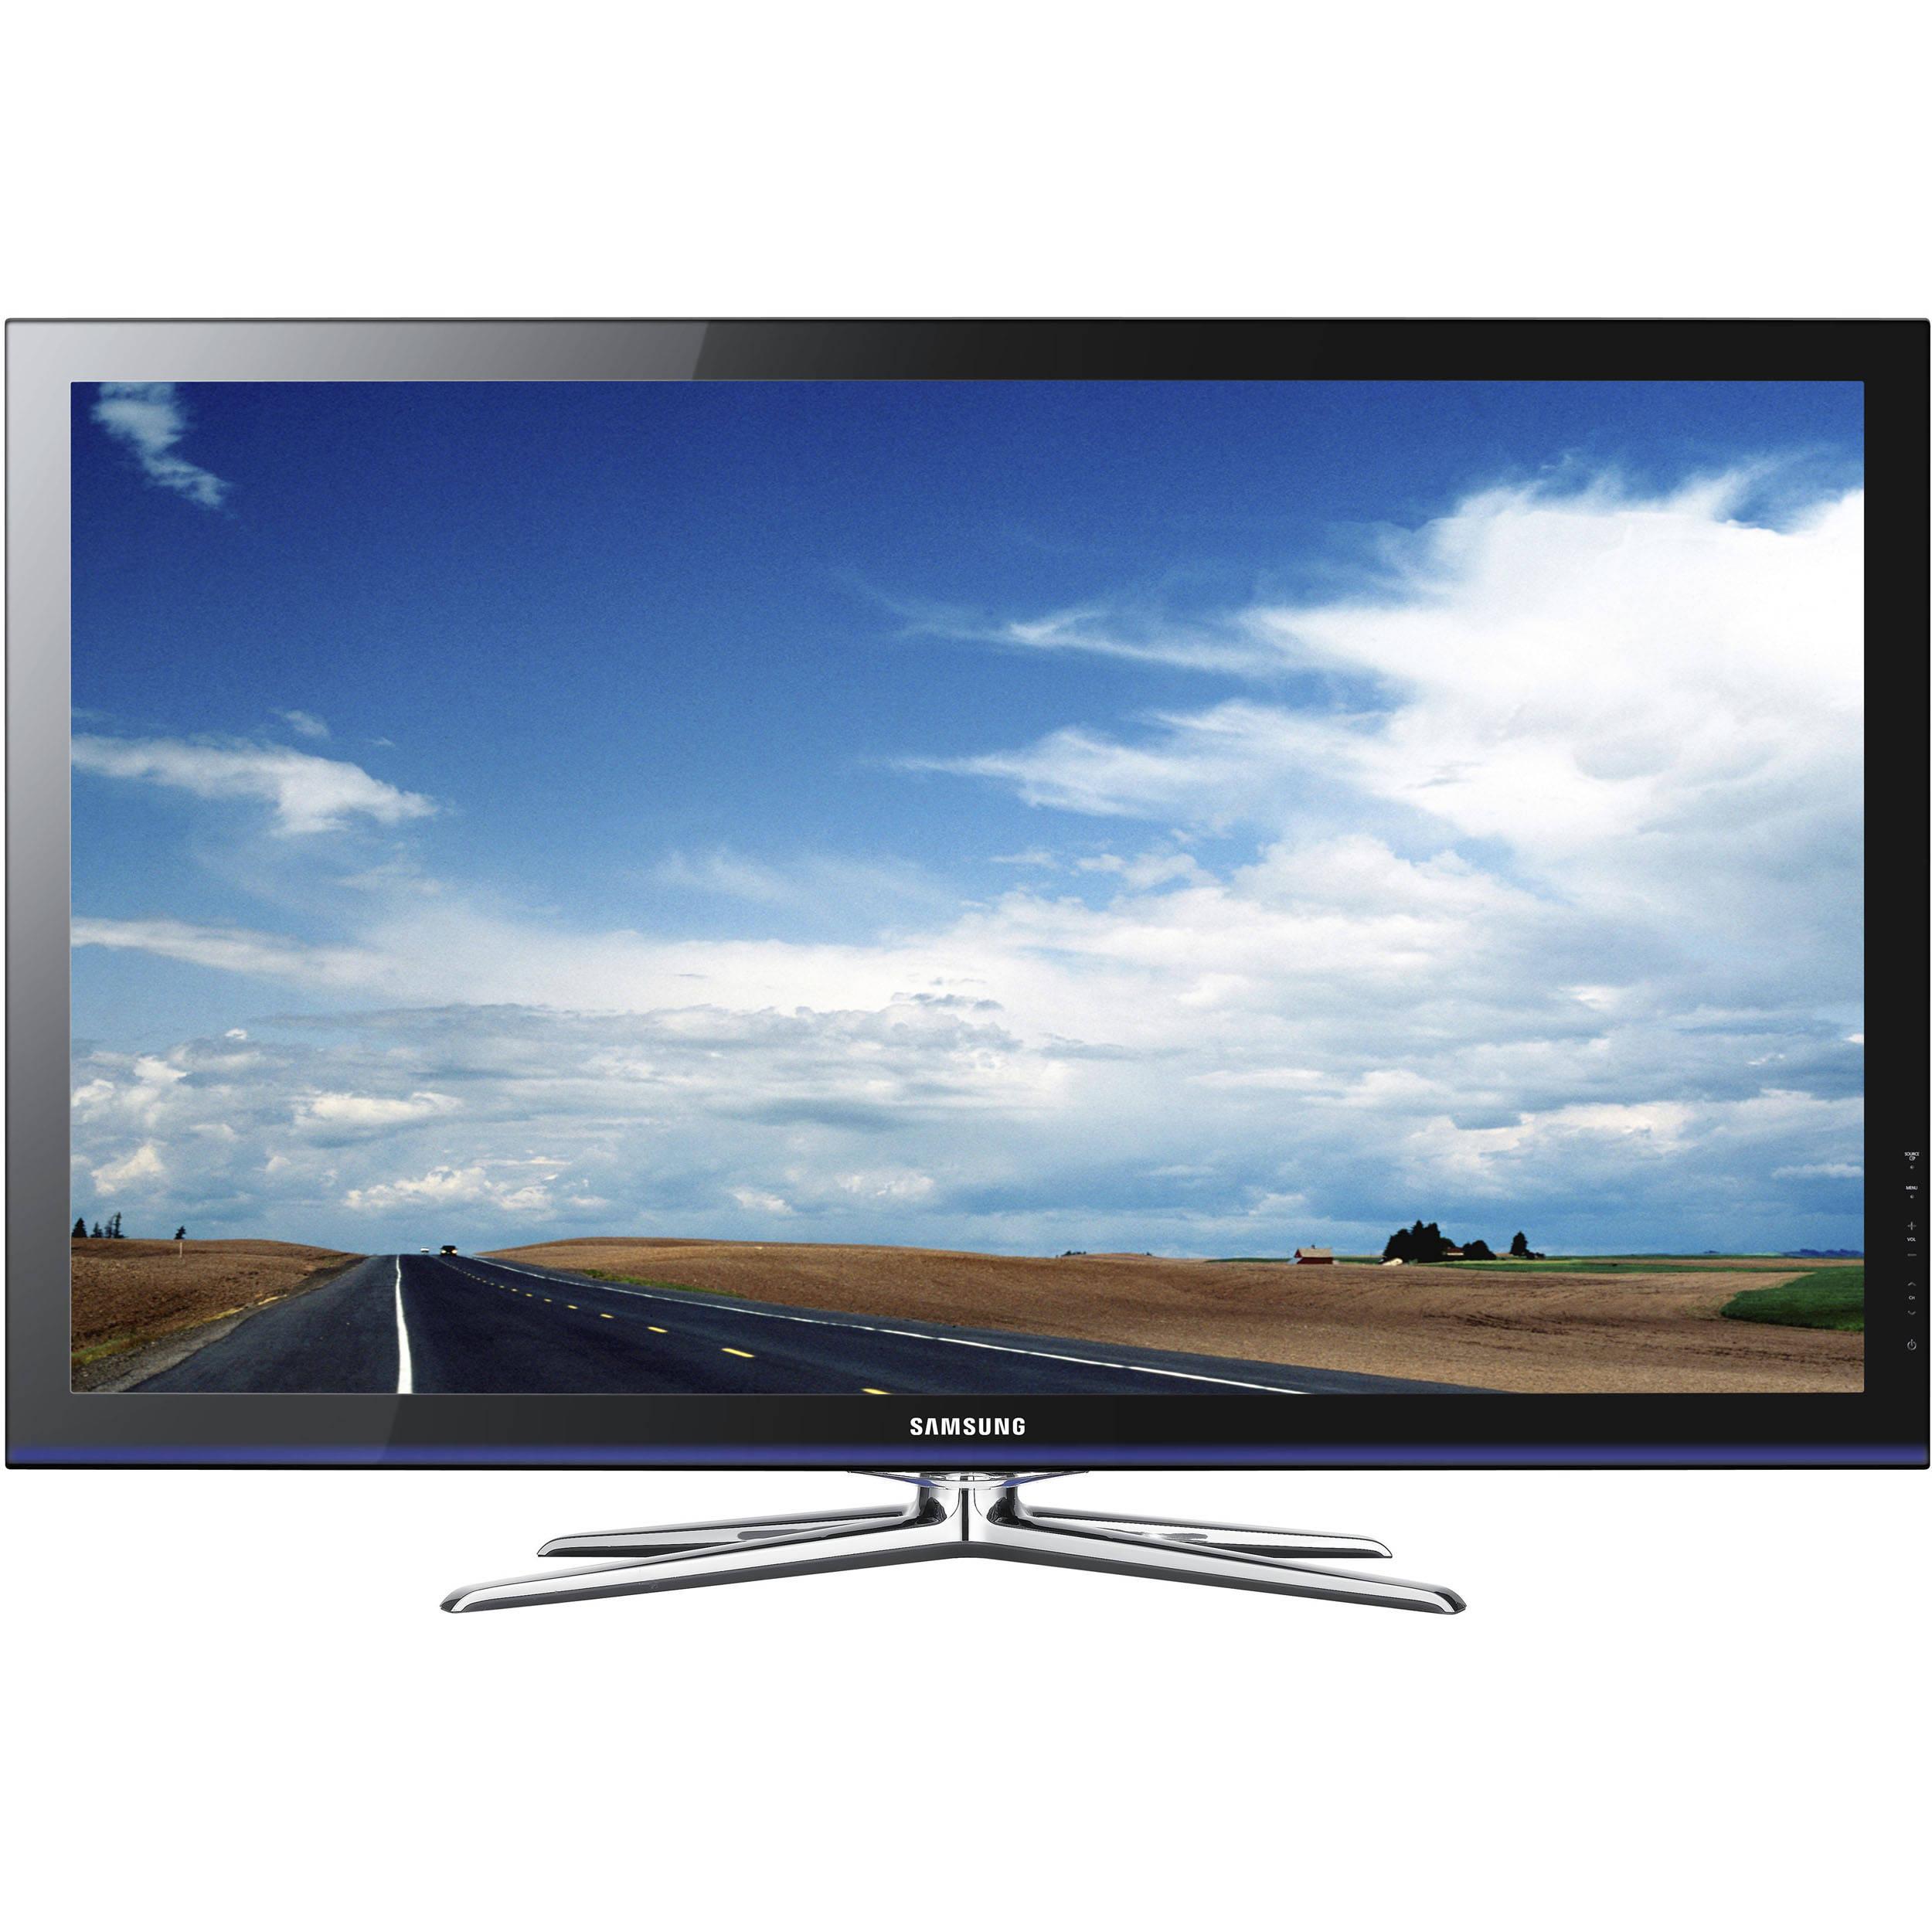 samsung tv srs trusurround hd manual